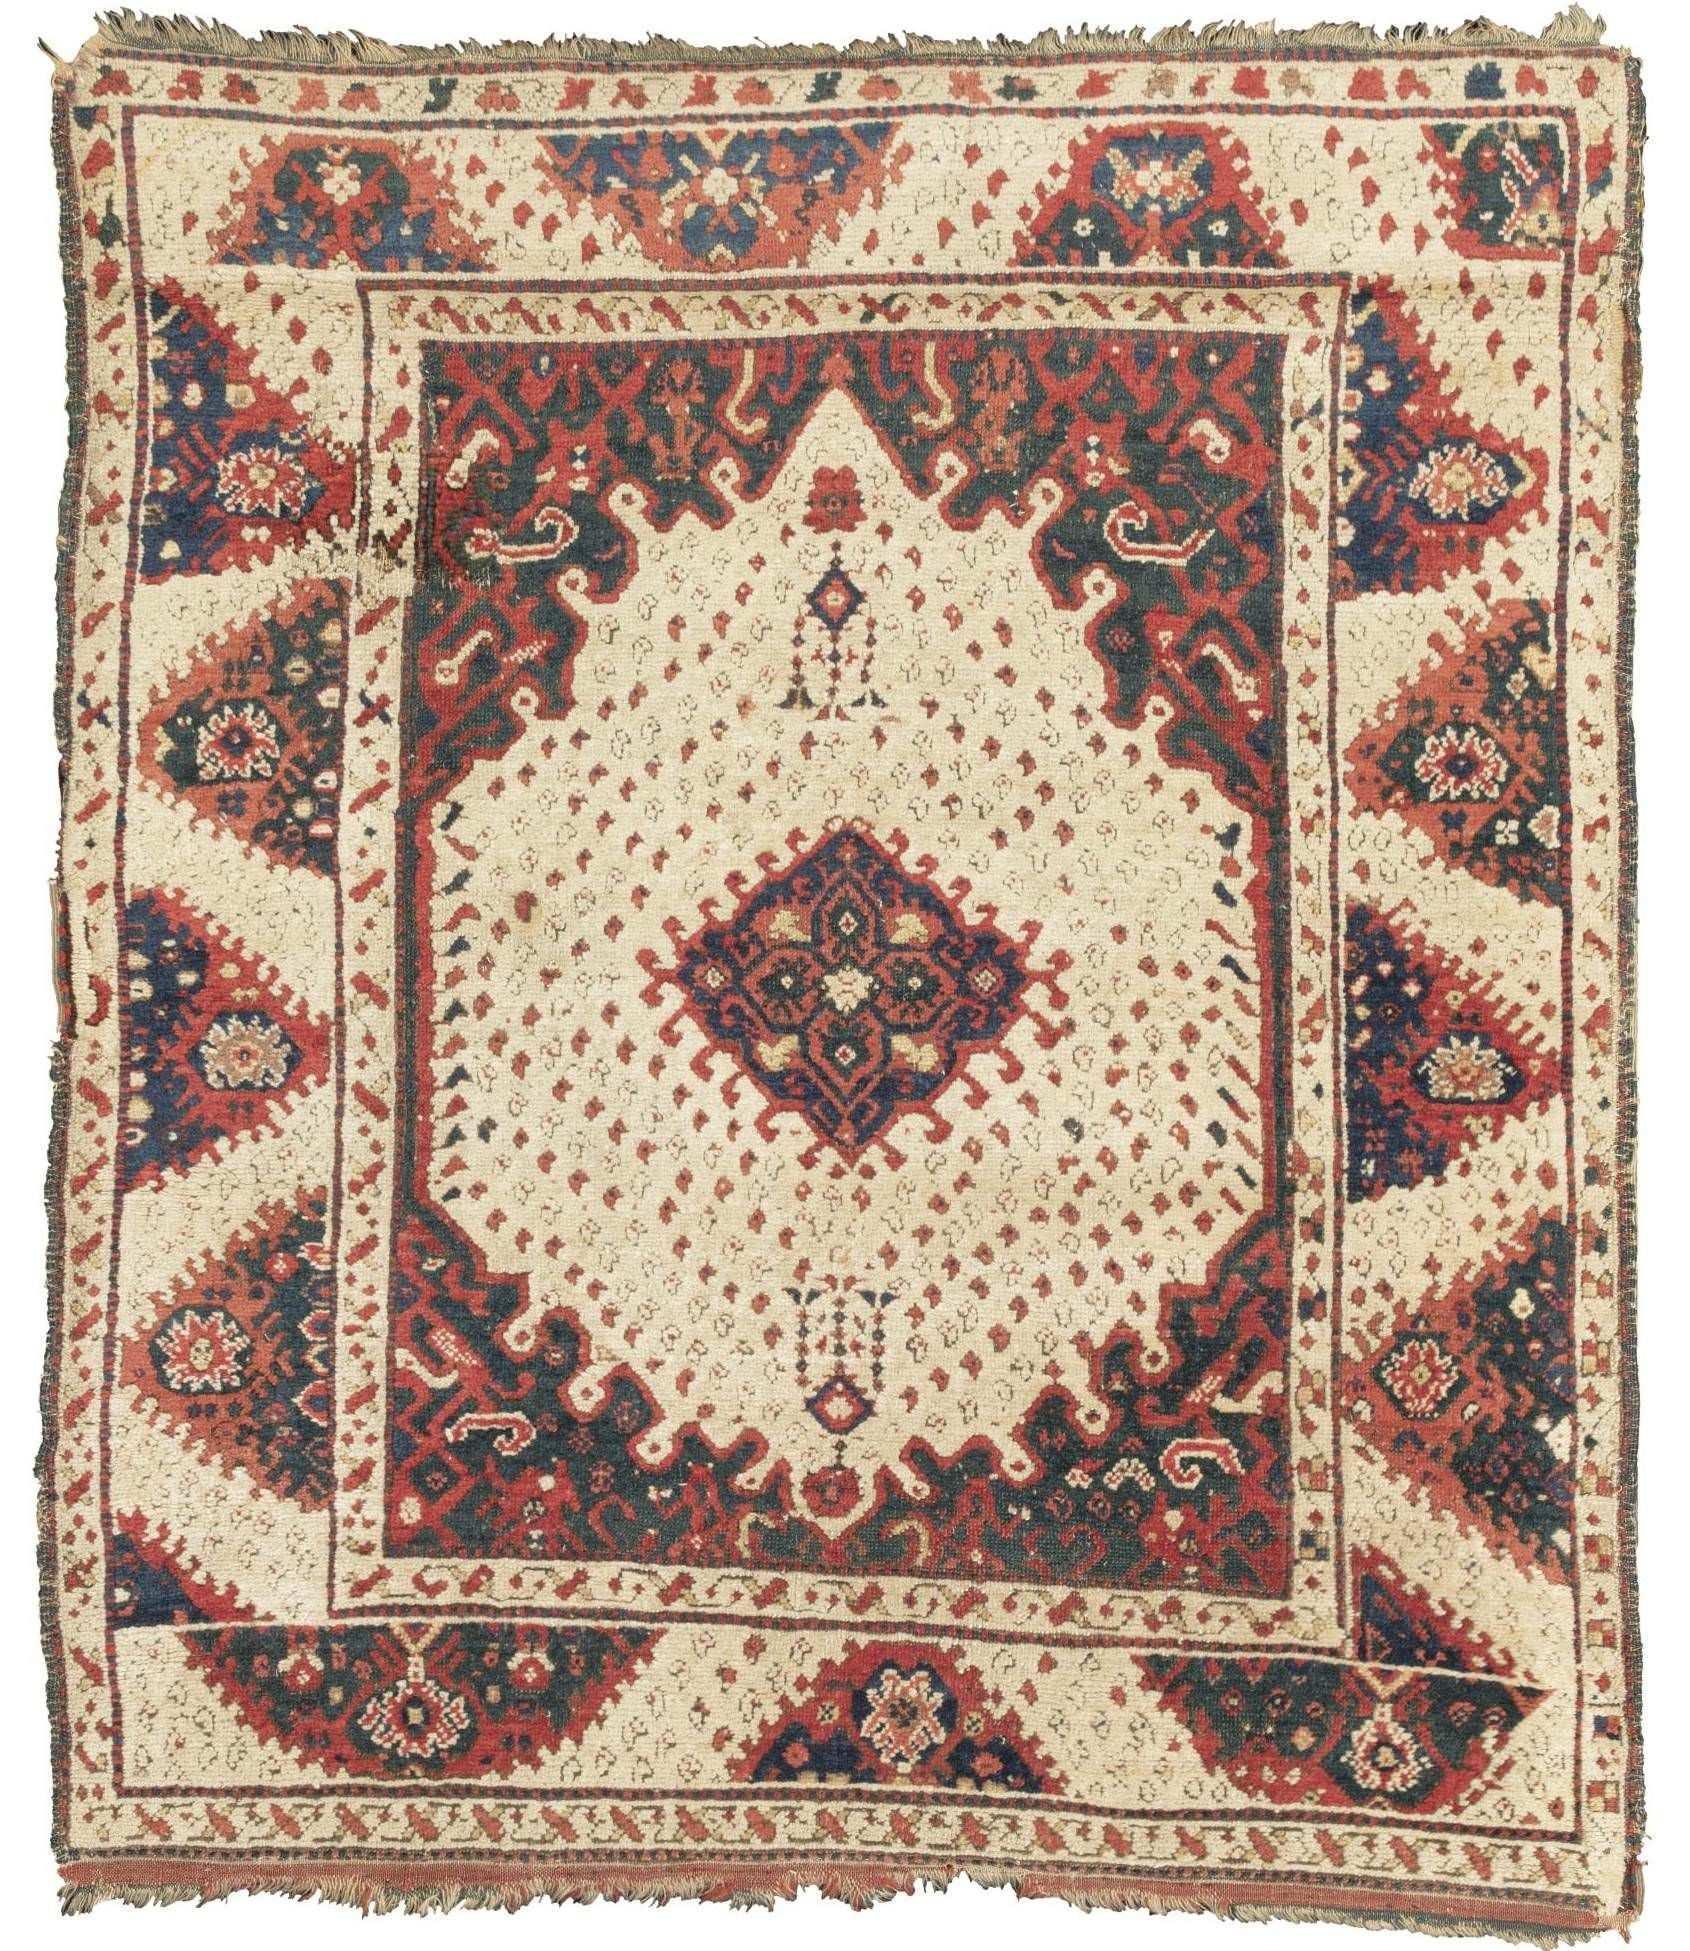 Kiz Ghiordes Rug West Anatolia Turkey Tribal Carpets Rugs Rugs On Carpet